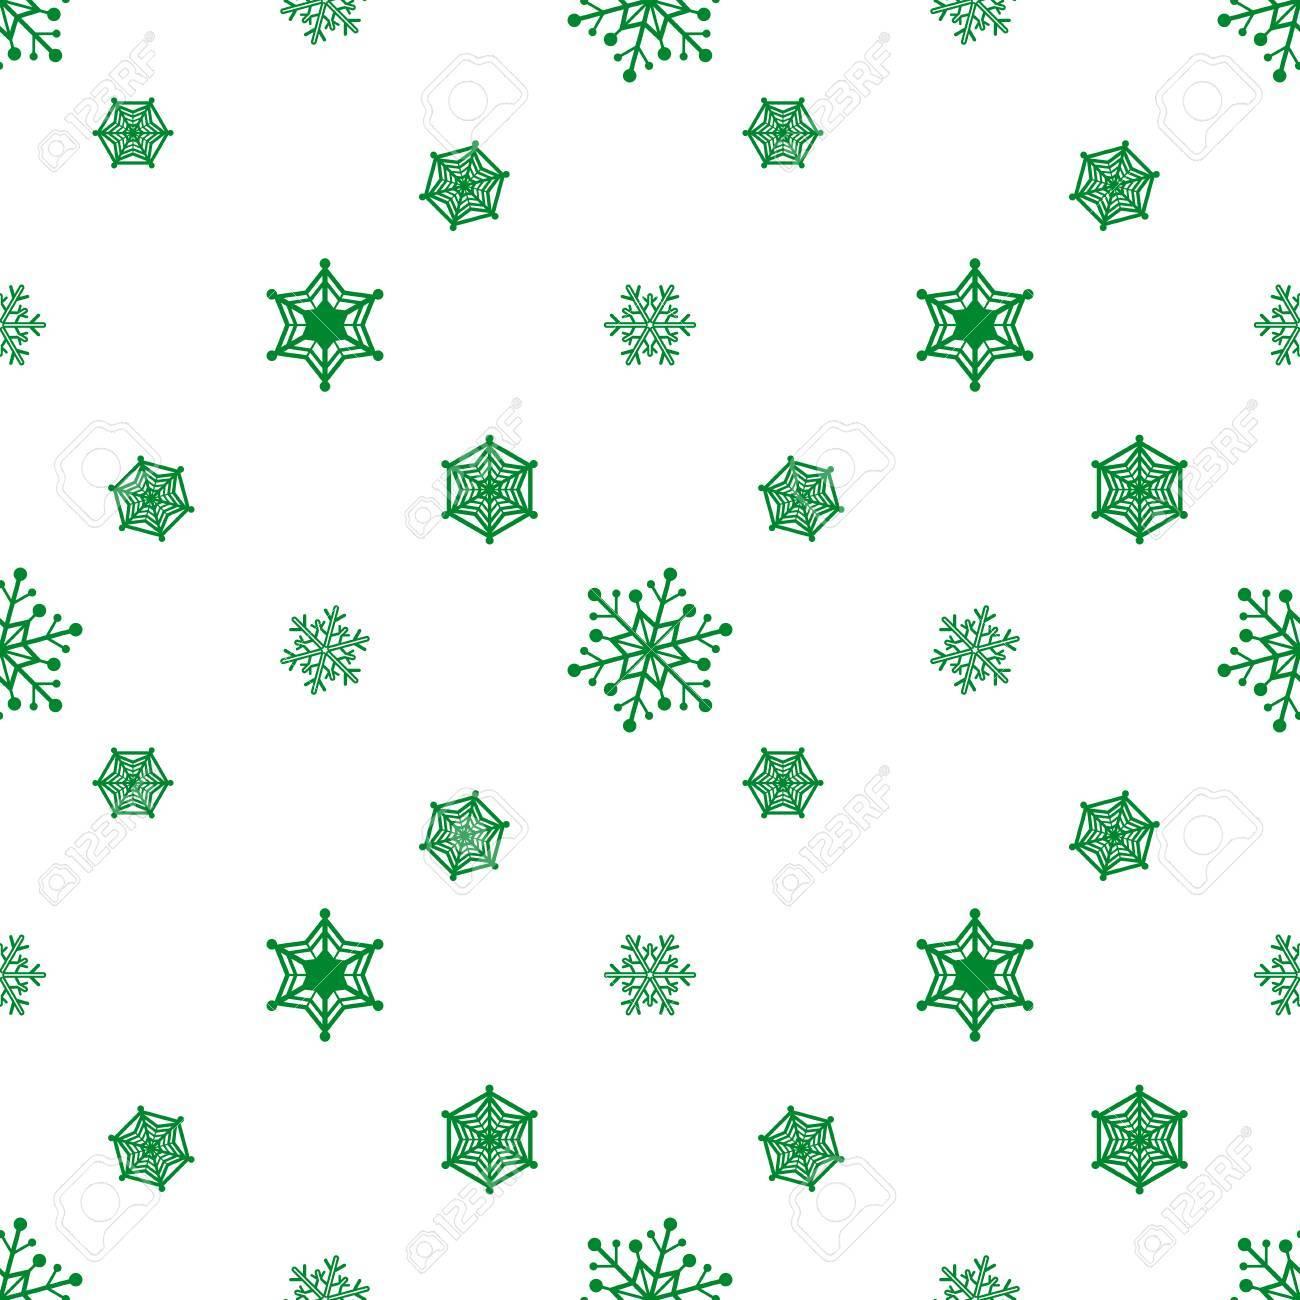 Snowflake Green Colour White Background Christmas Pattern Wallpaper Stock Vector